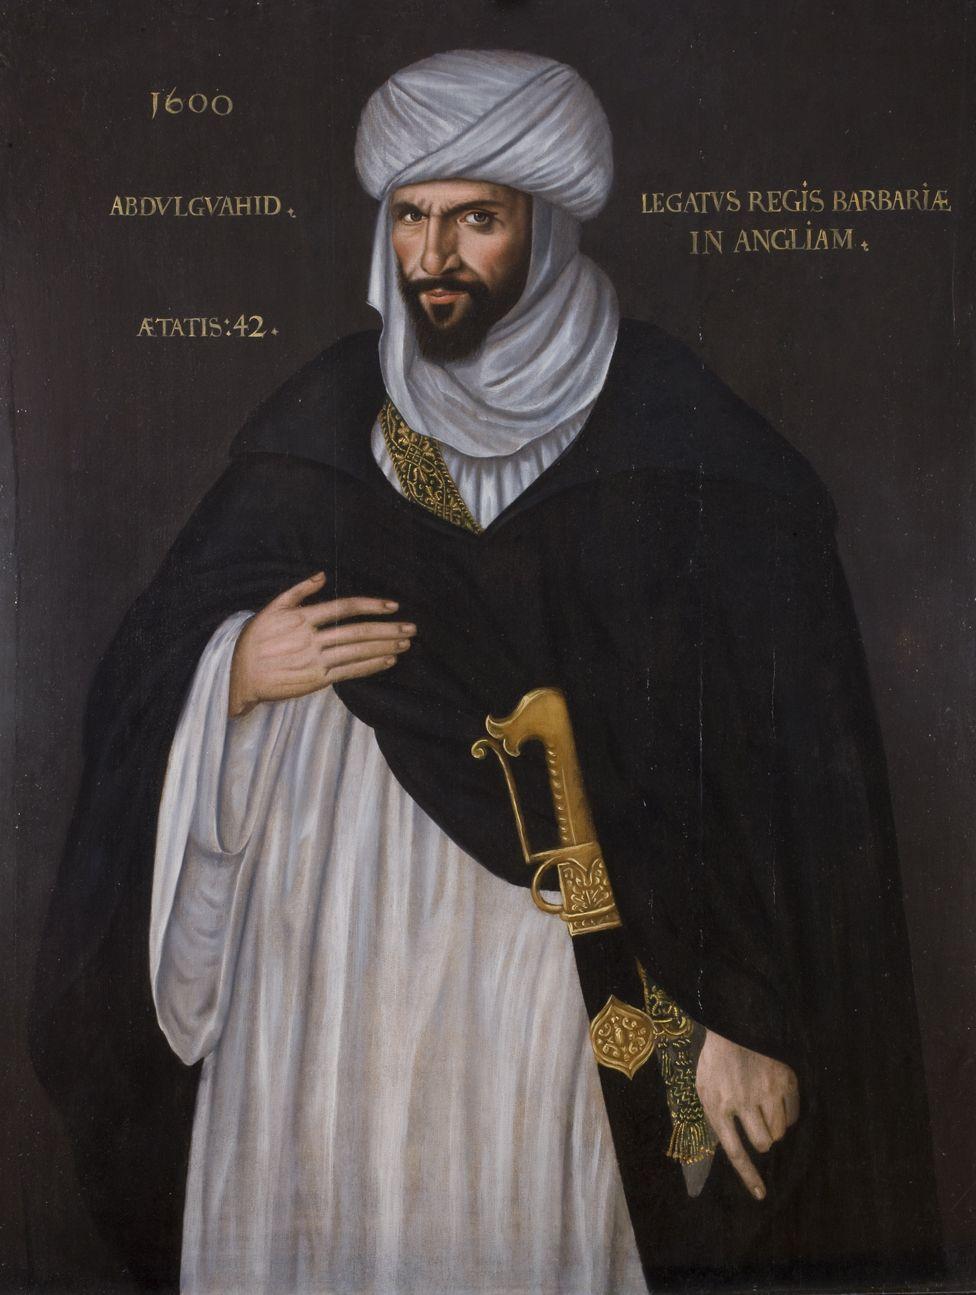 Abd el-Ouahed ben Messaoud ben Mohammed Anoun, Moorish Ambassador to Queen Elizabeth I, 1600, oil on panel